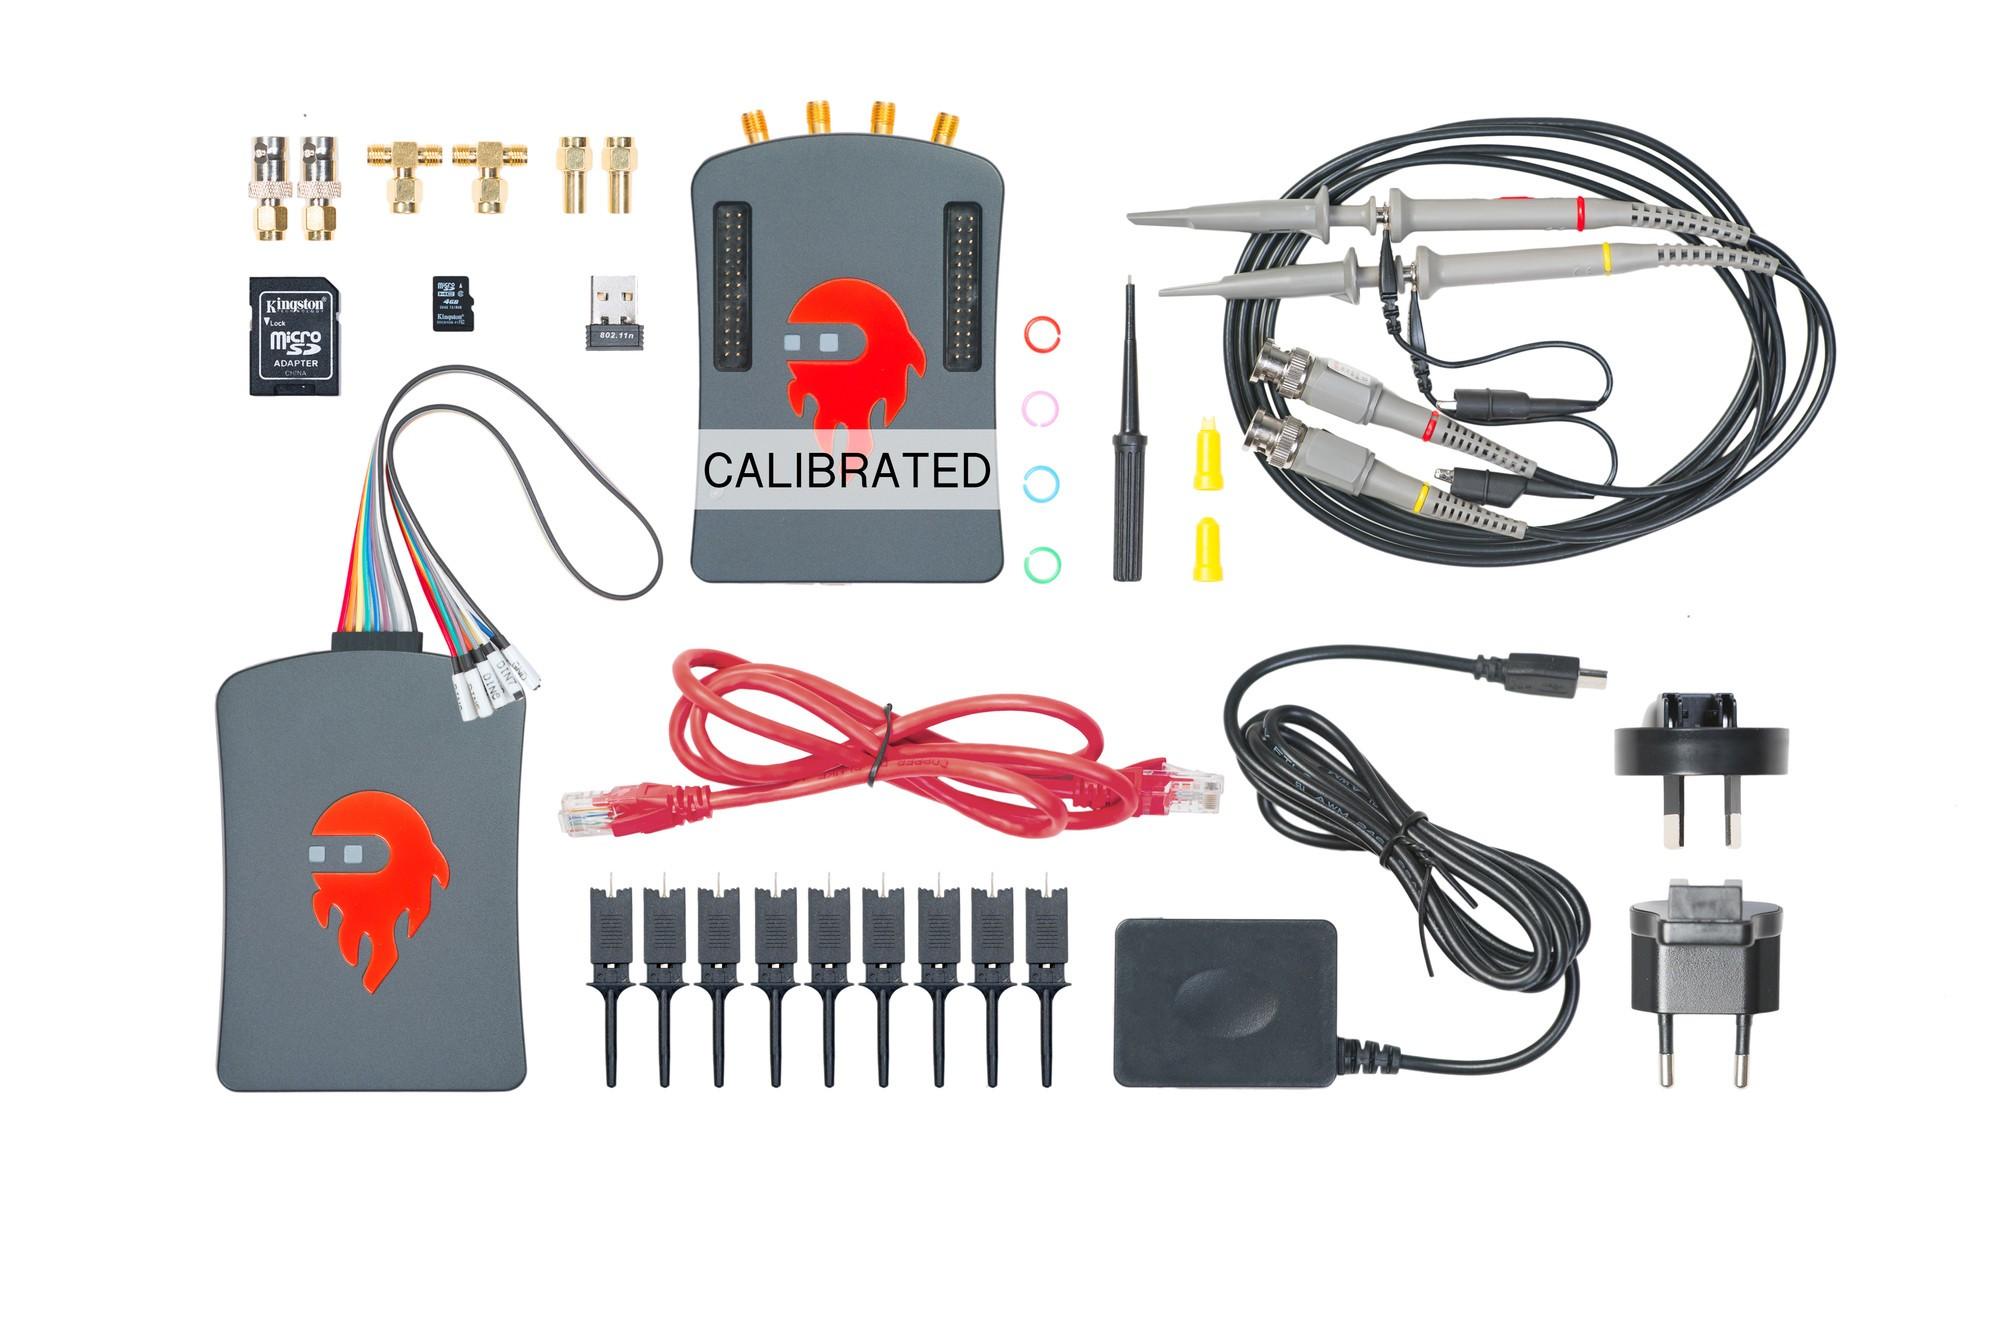 Red Pitaya V1.1 (Calibrated Diagnostic Kit)